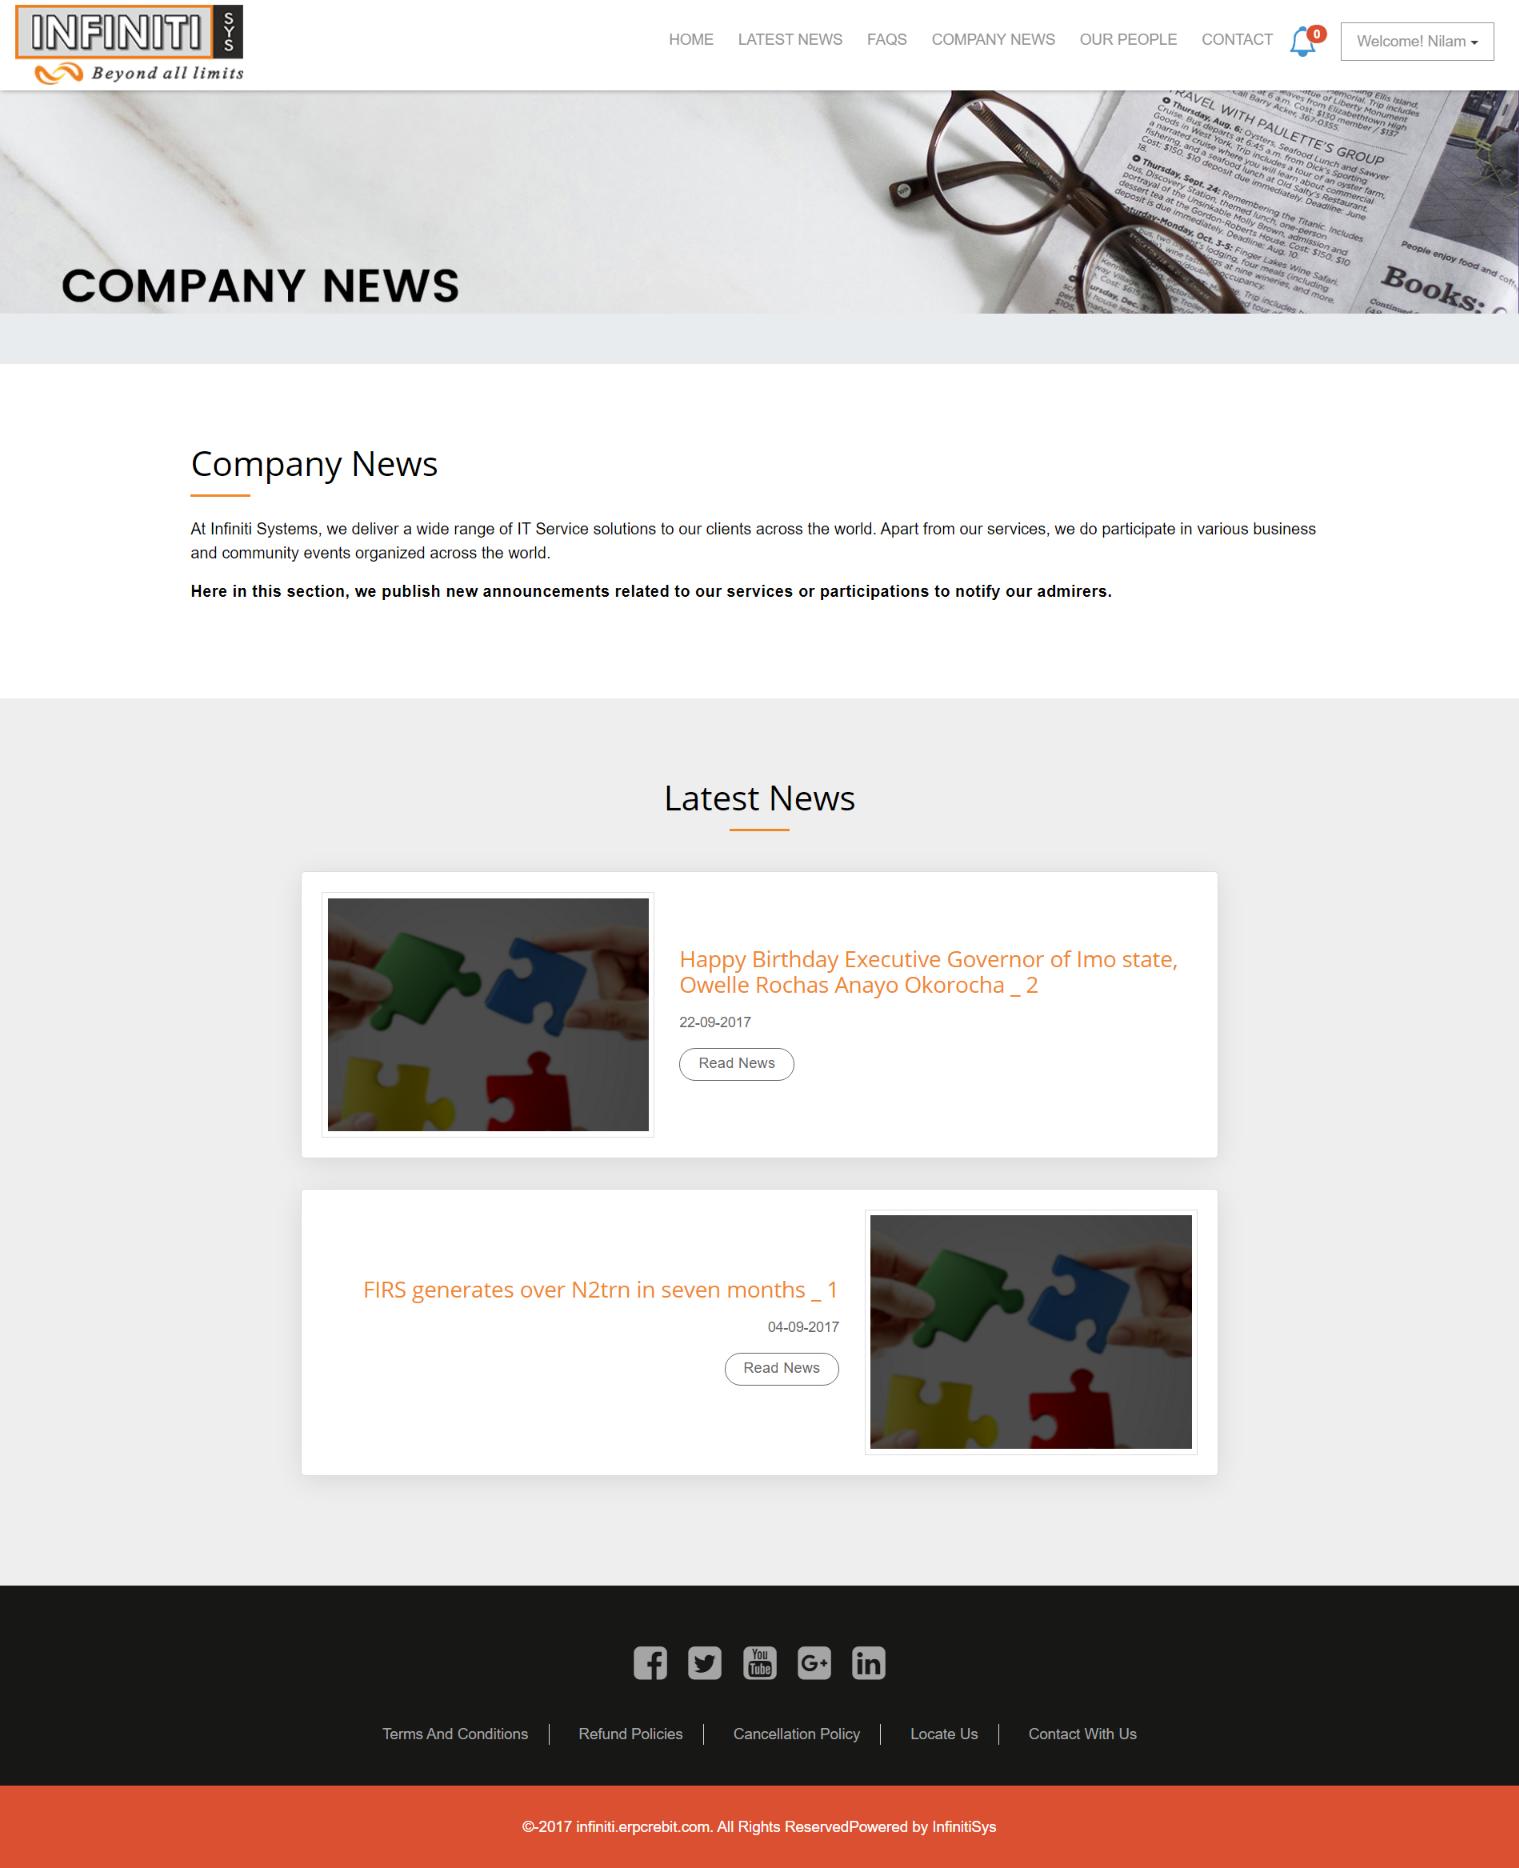 news_detail_img